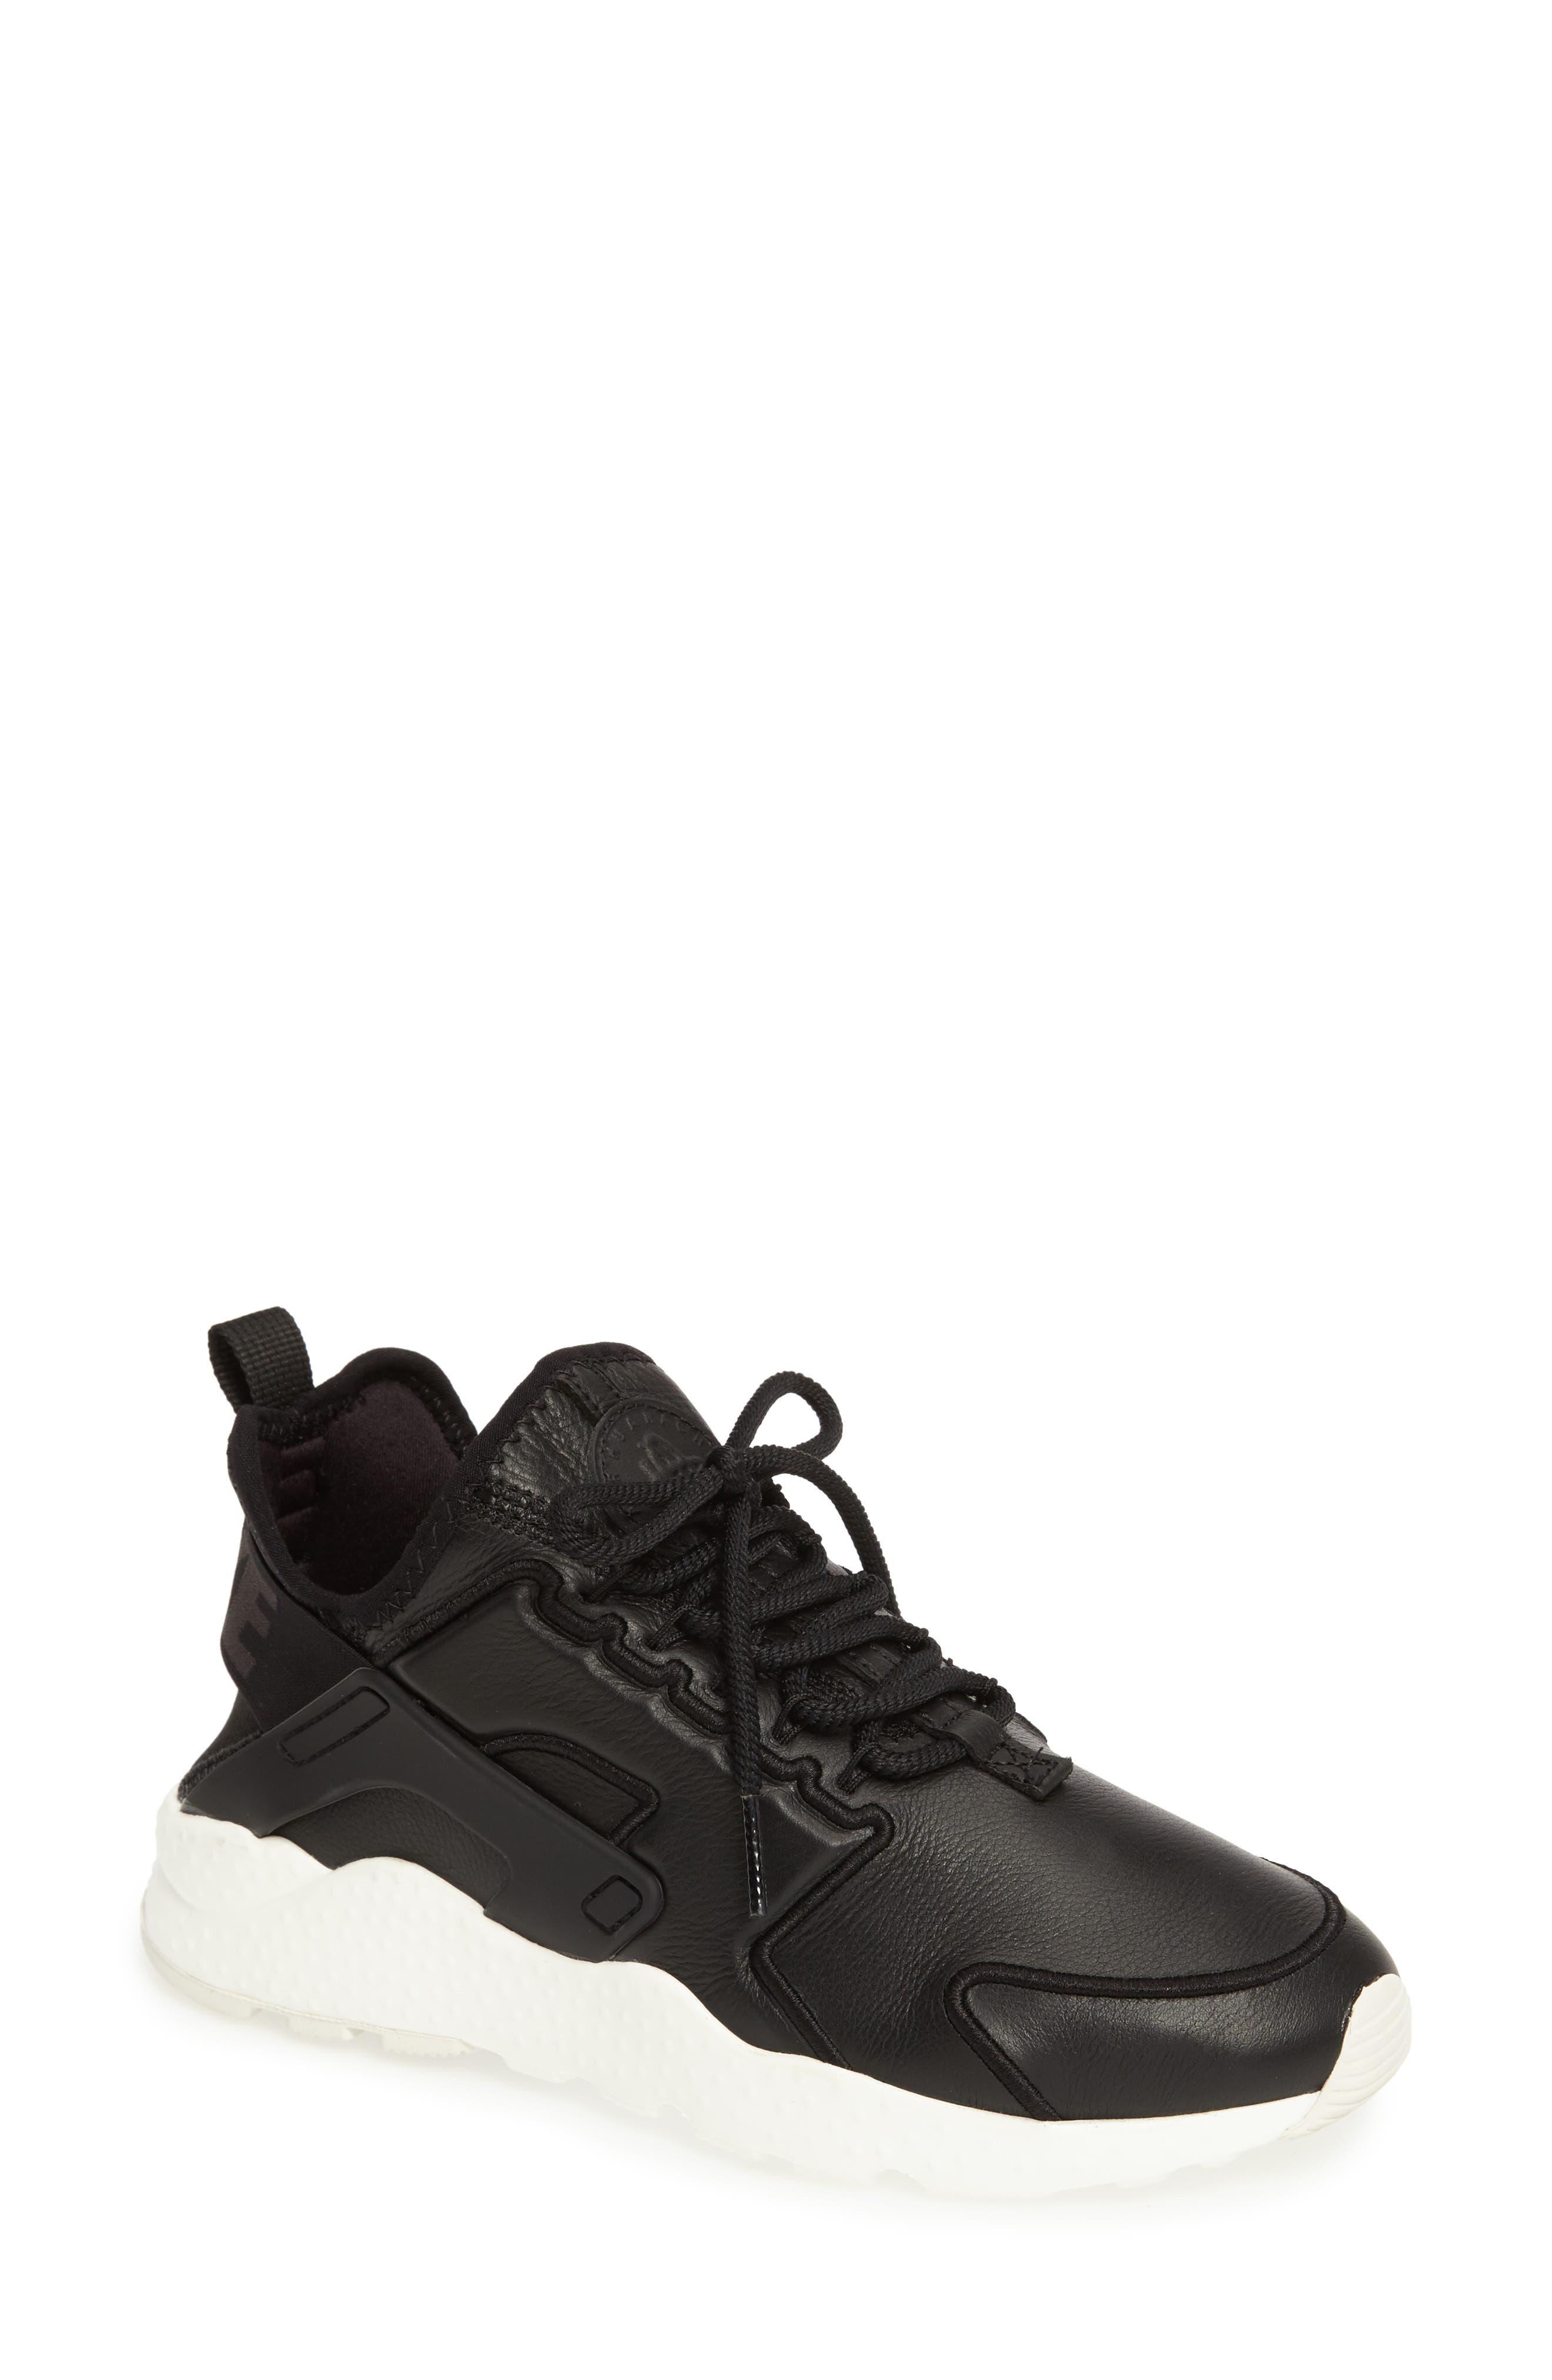 Main Image - Nike Air Huarache Run Ultra Sneaker (Women)